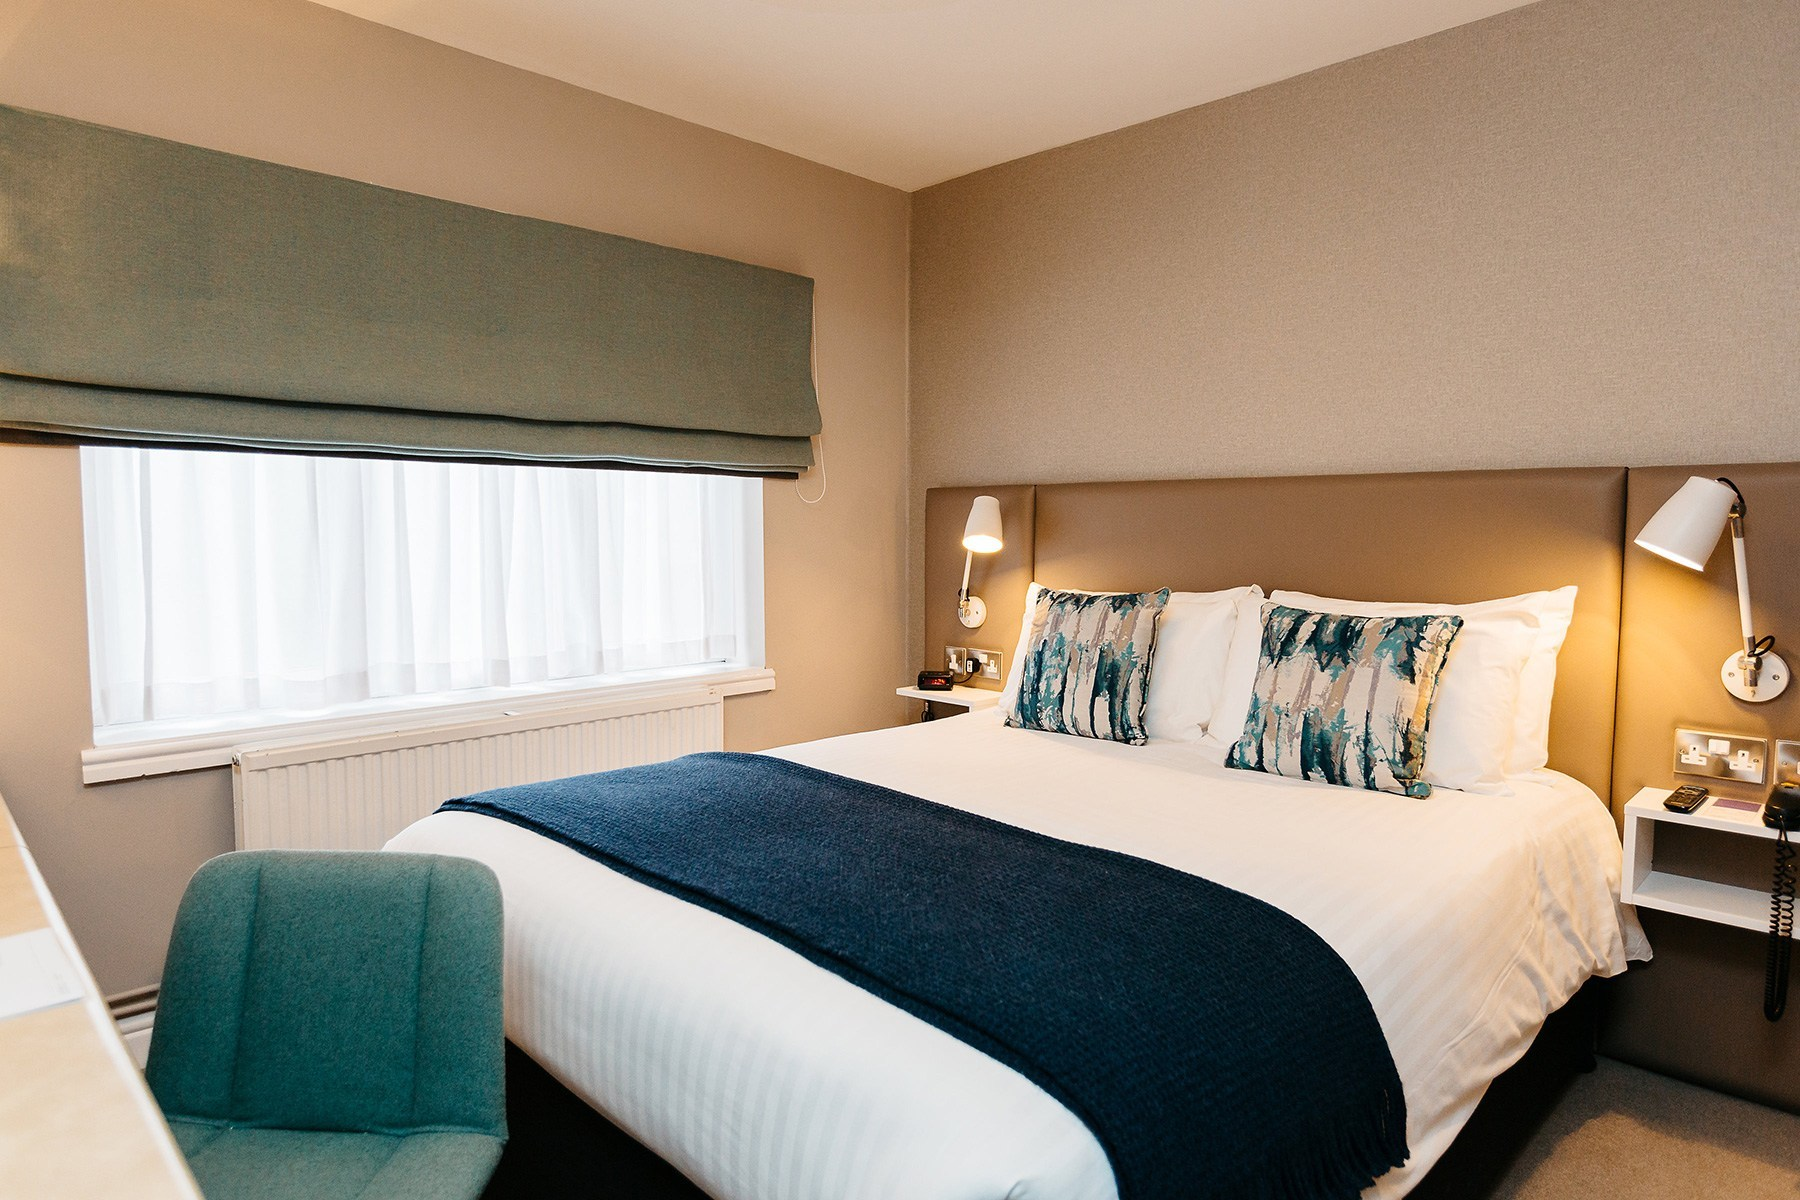 UOB-HAS-hotel-rooms-apr-18-101-large-web.jpg